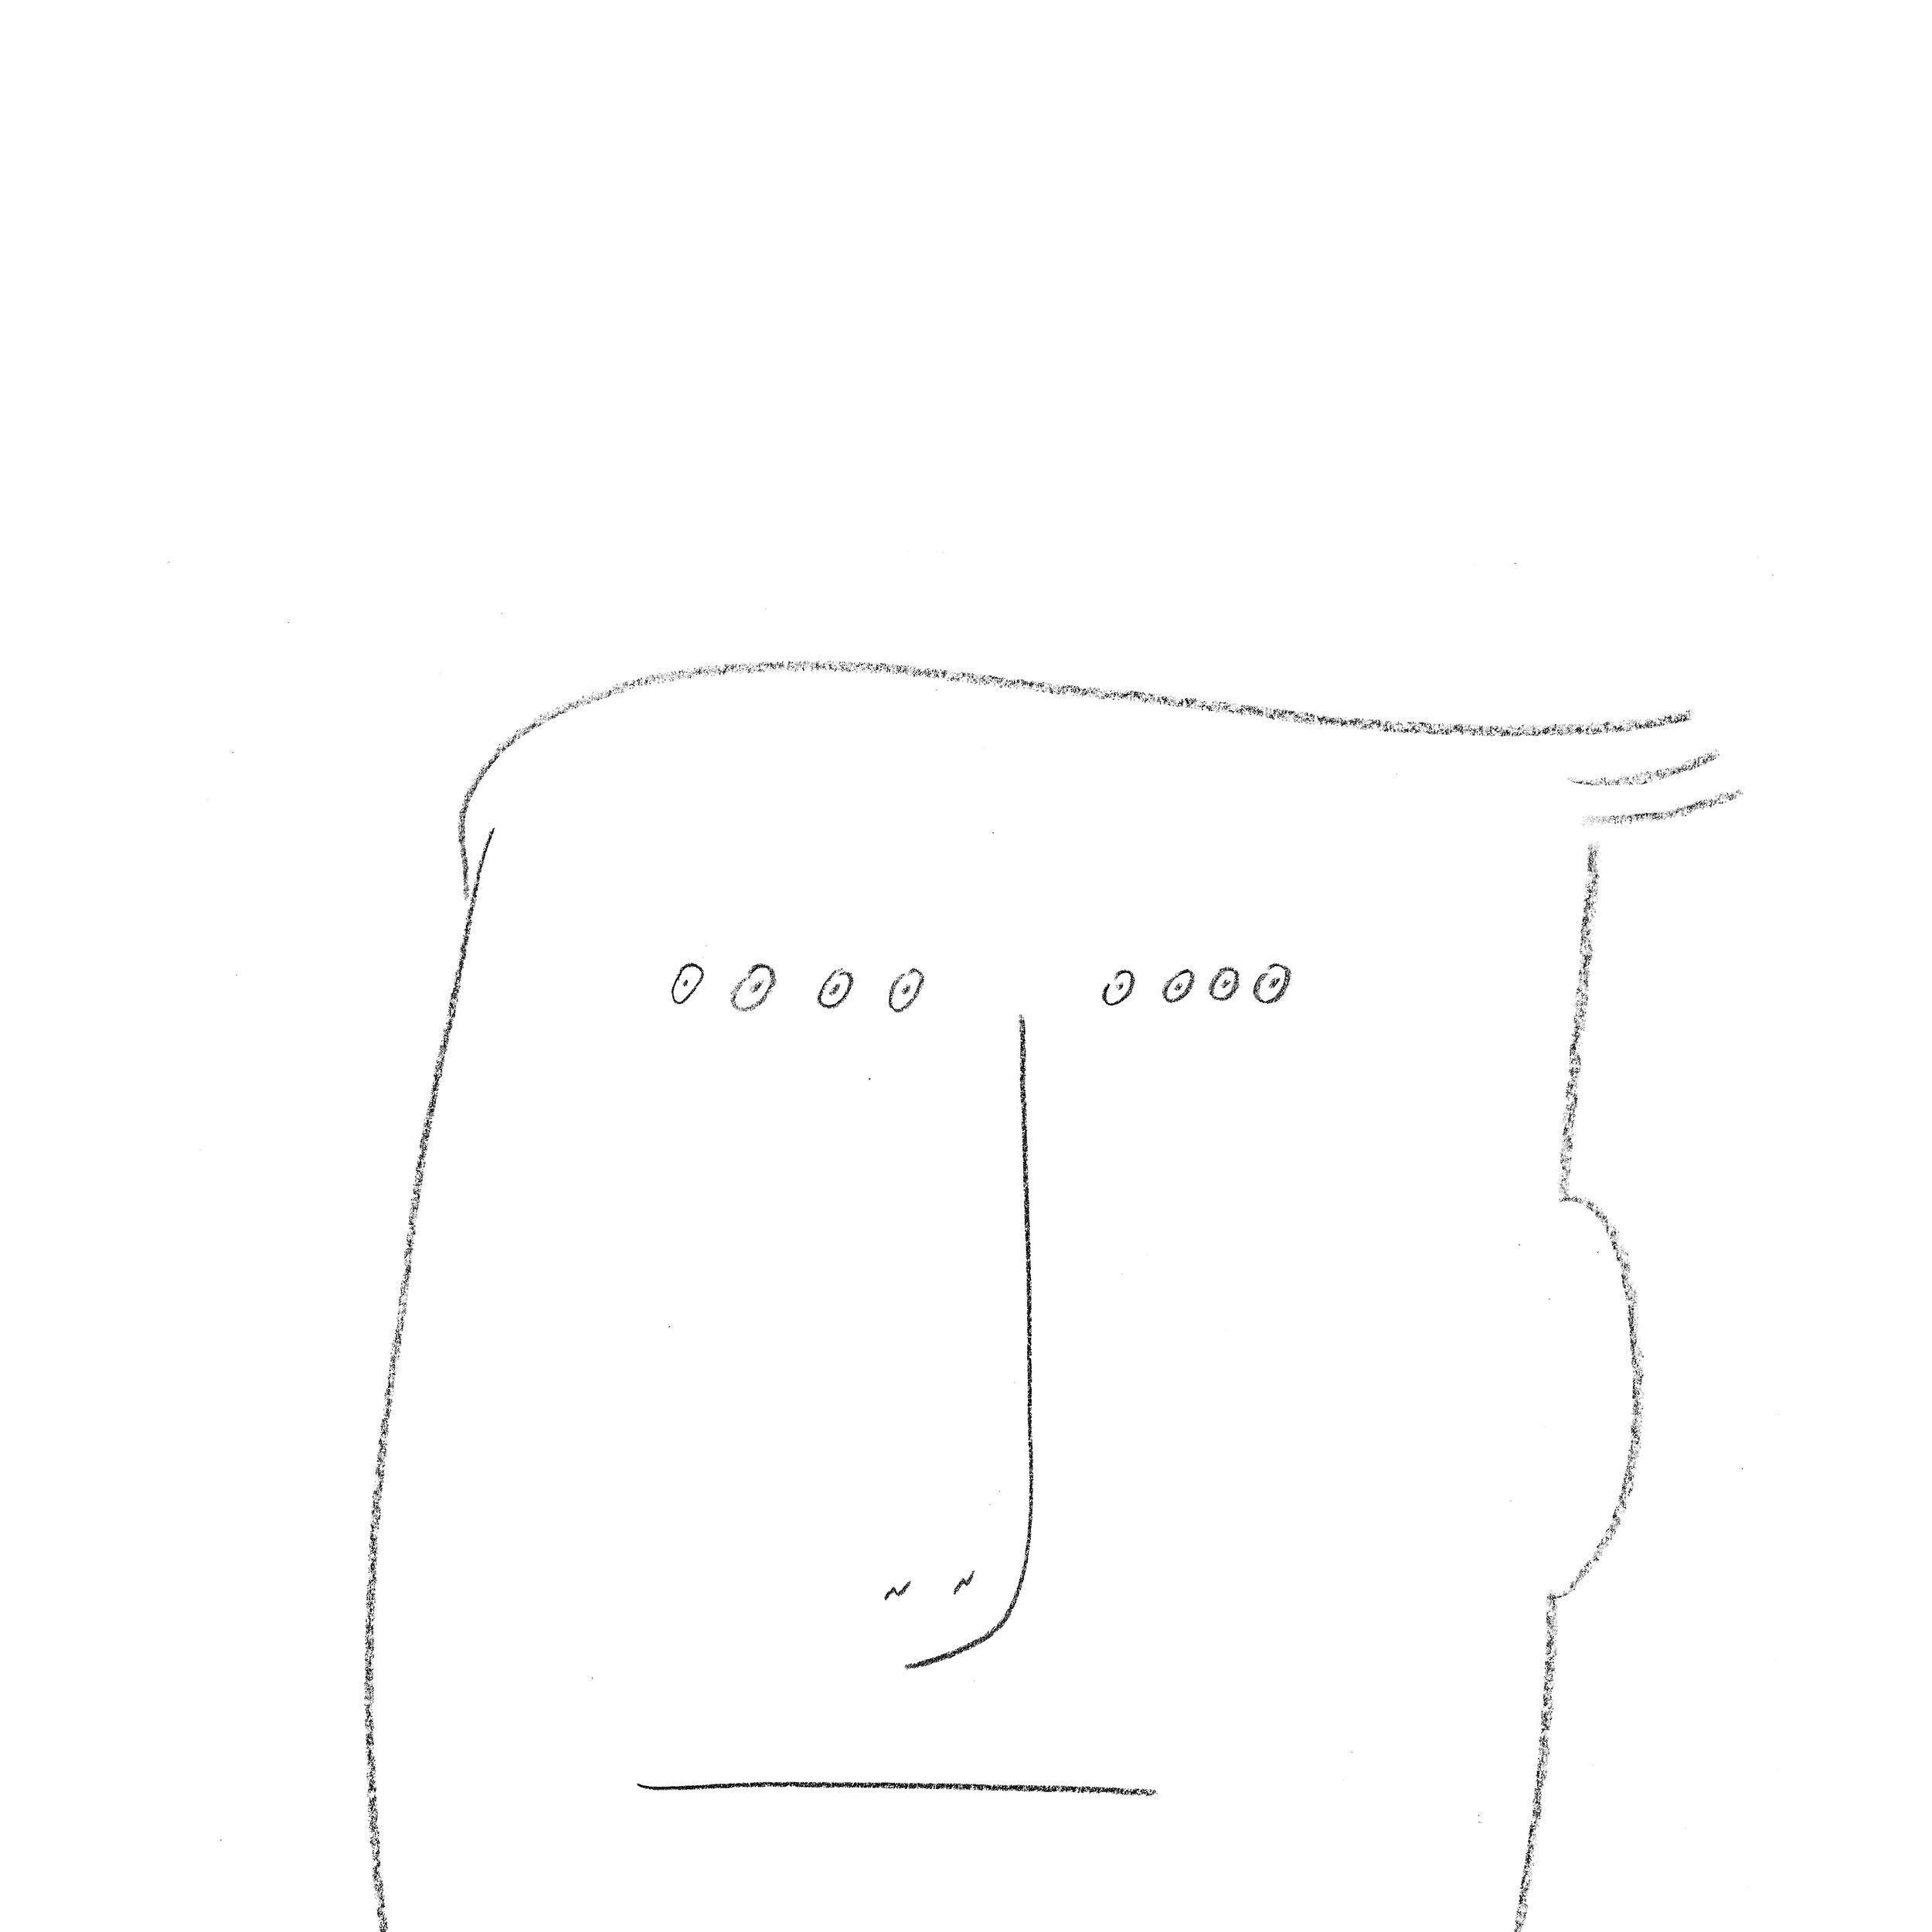 f.s 36.jpg